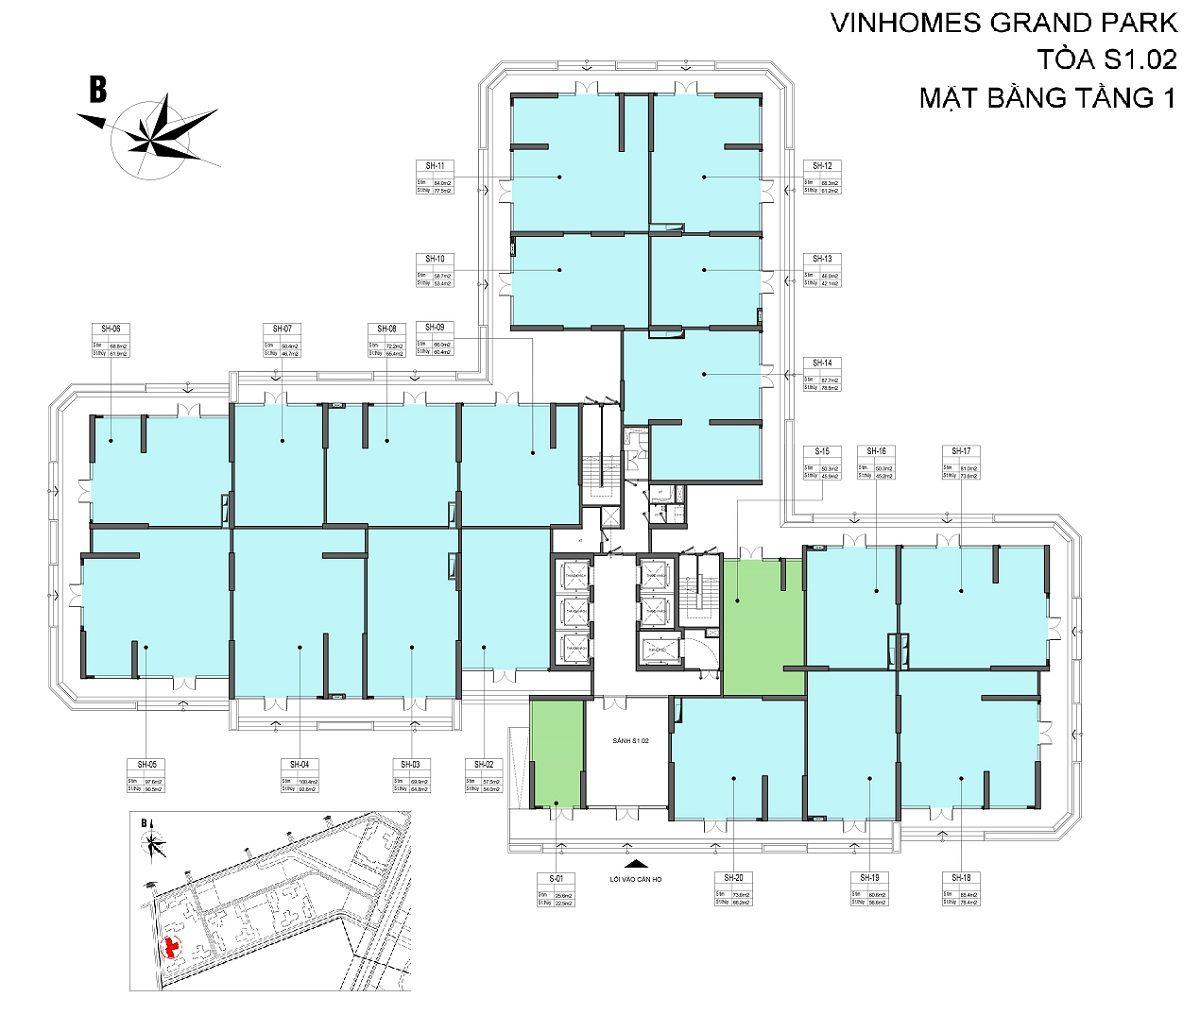 shophouse vinhomes grand park s1.02